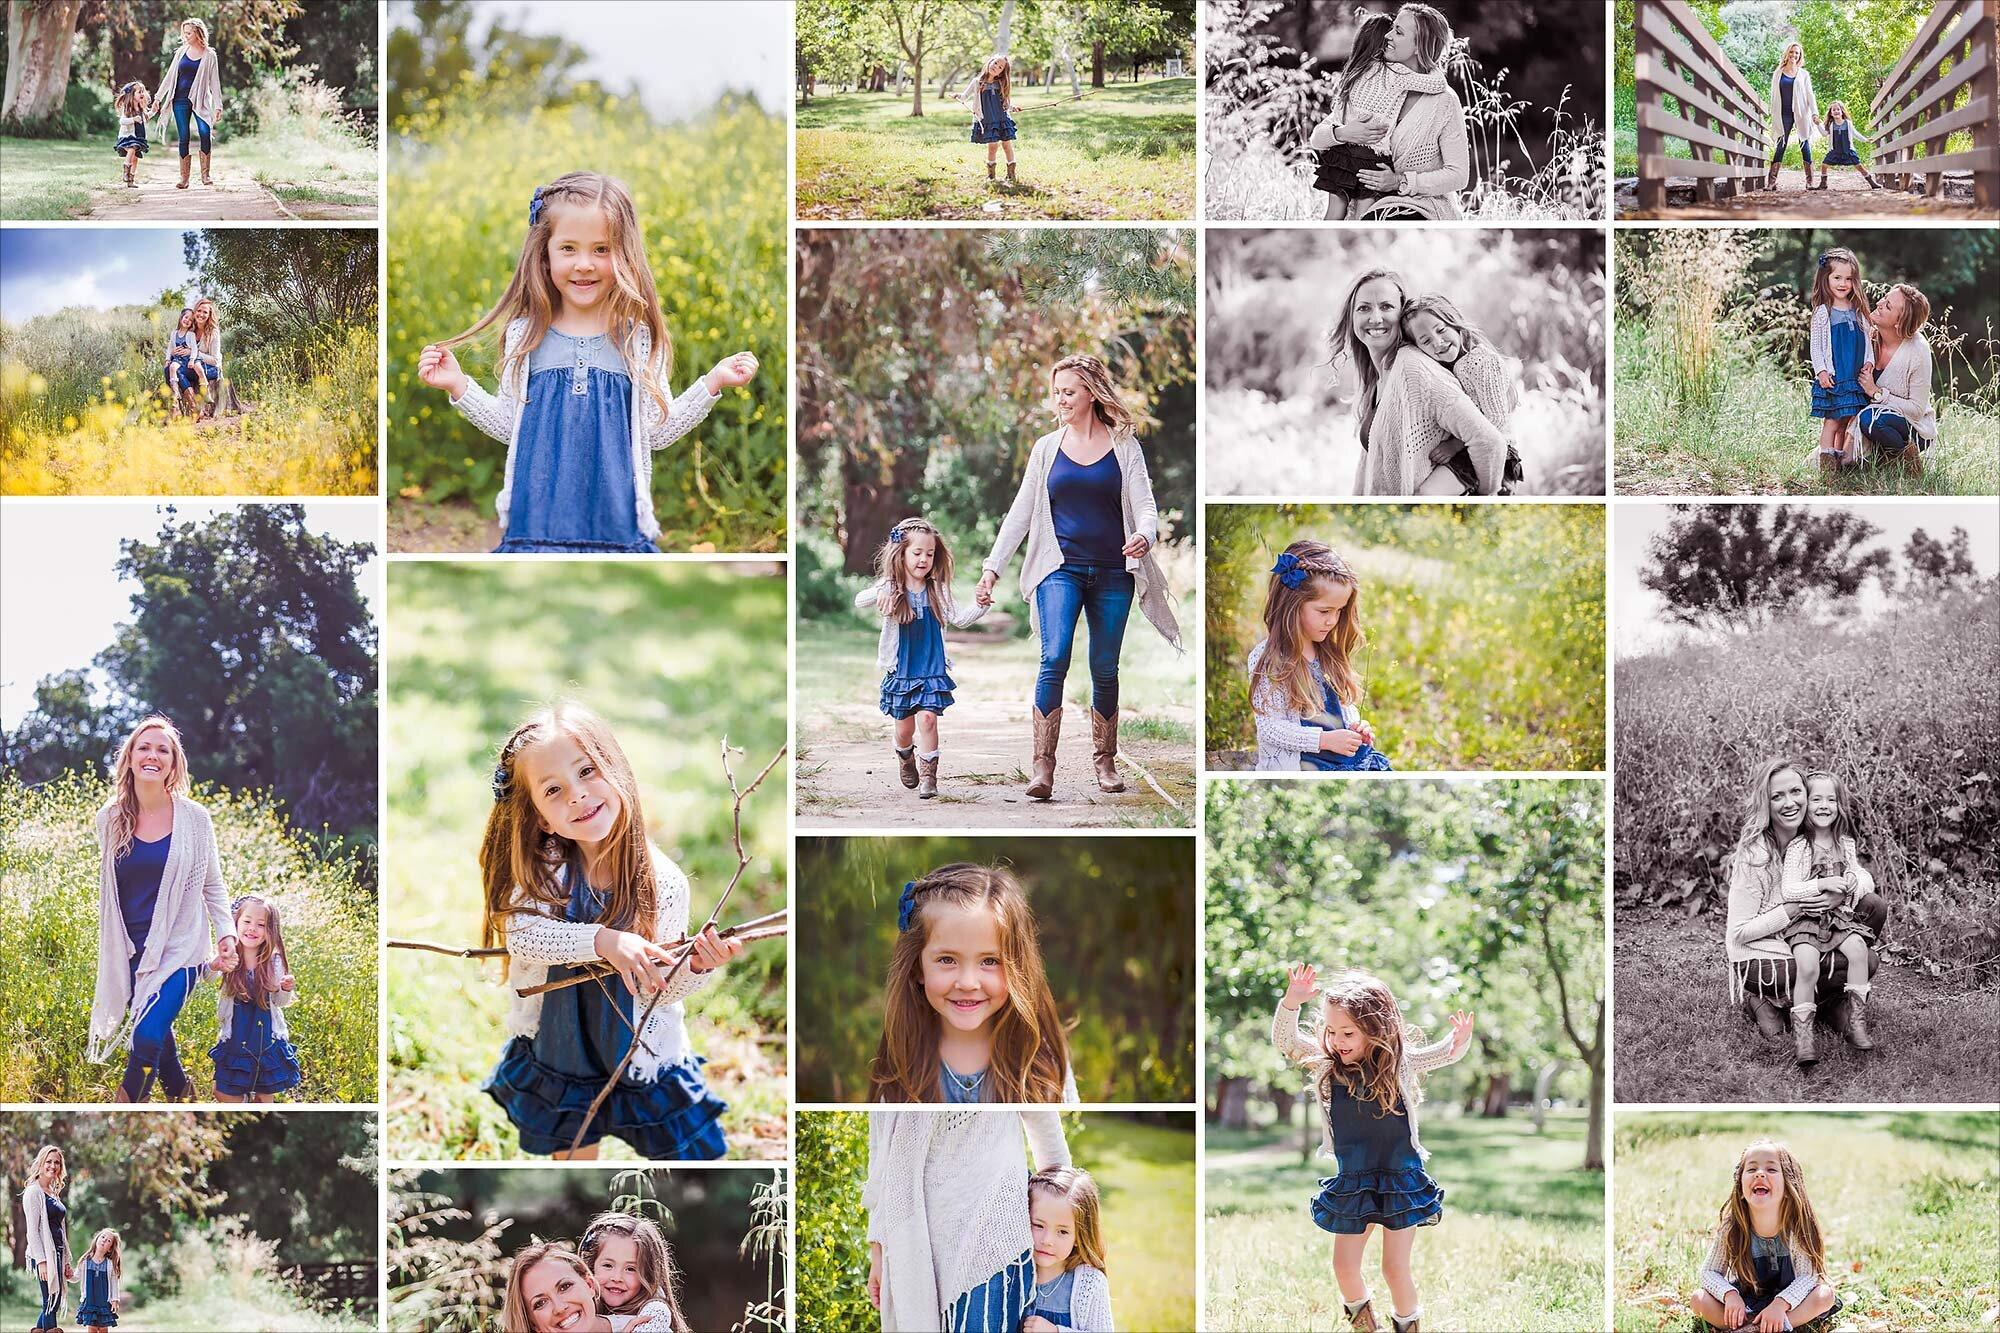 family_portraits_gallery_2_stephen_grant_photography.jpg